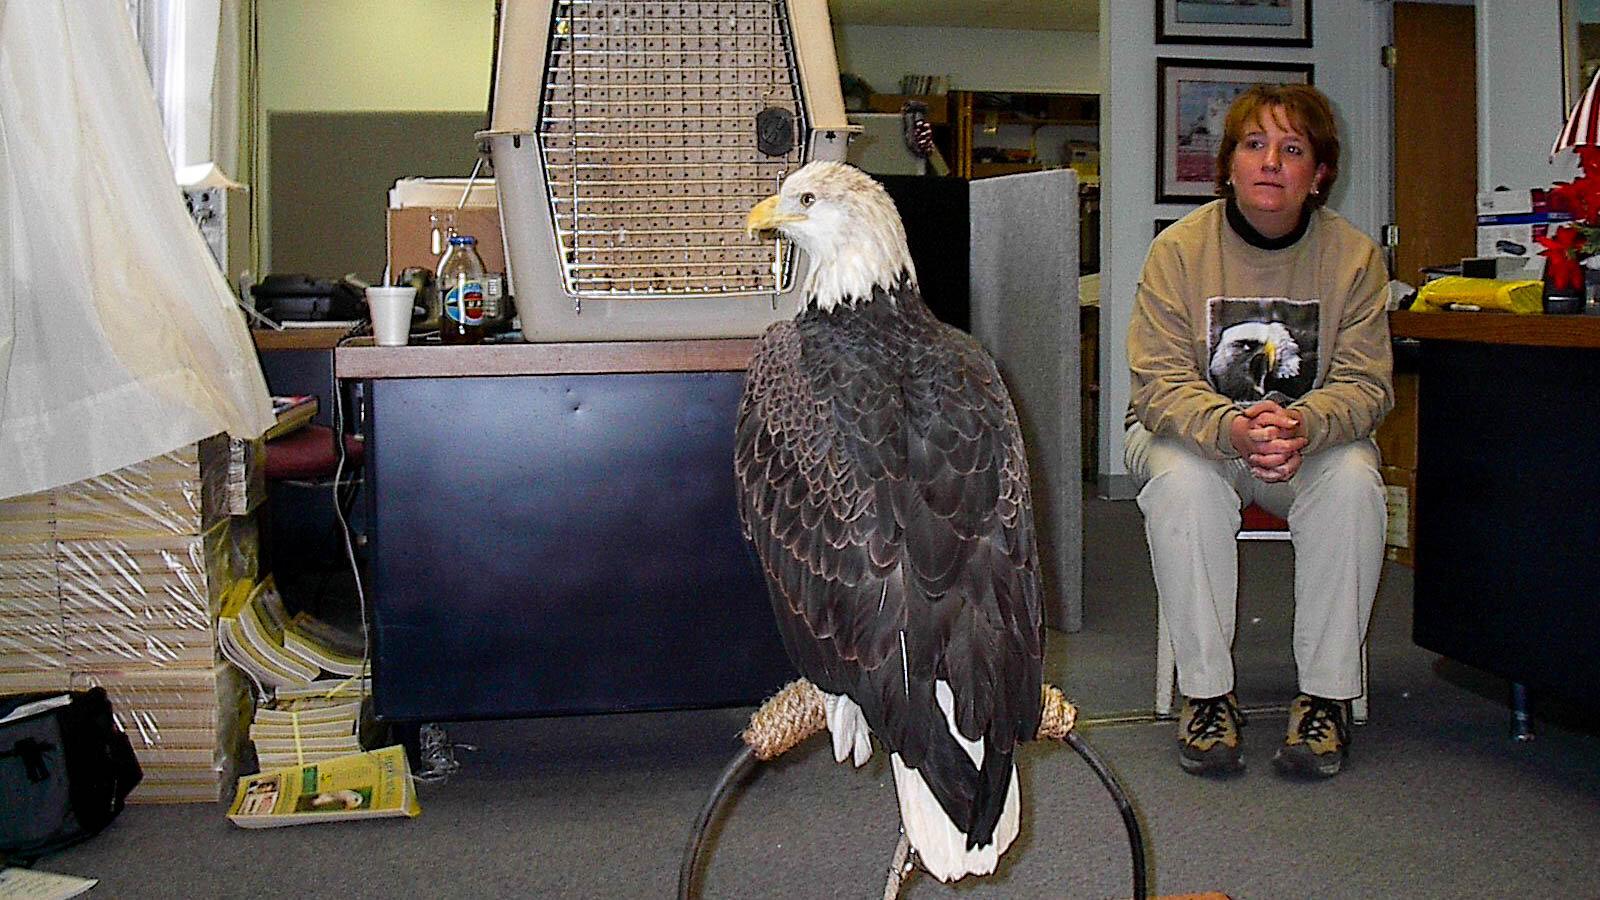 alton-eagle-01052002-alr-c169-1700.jpg